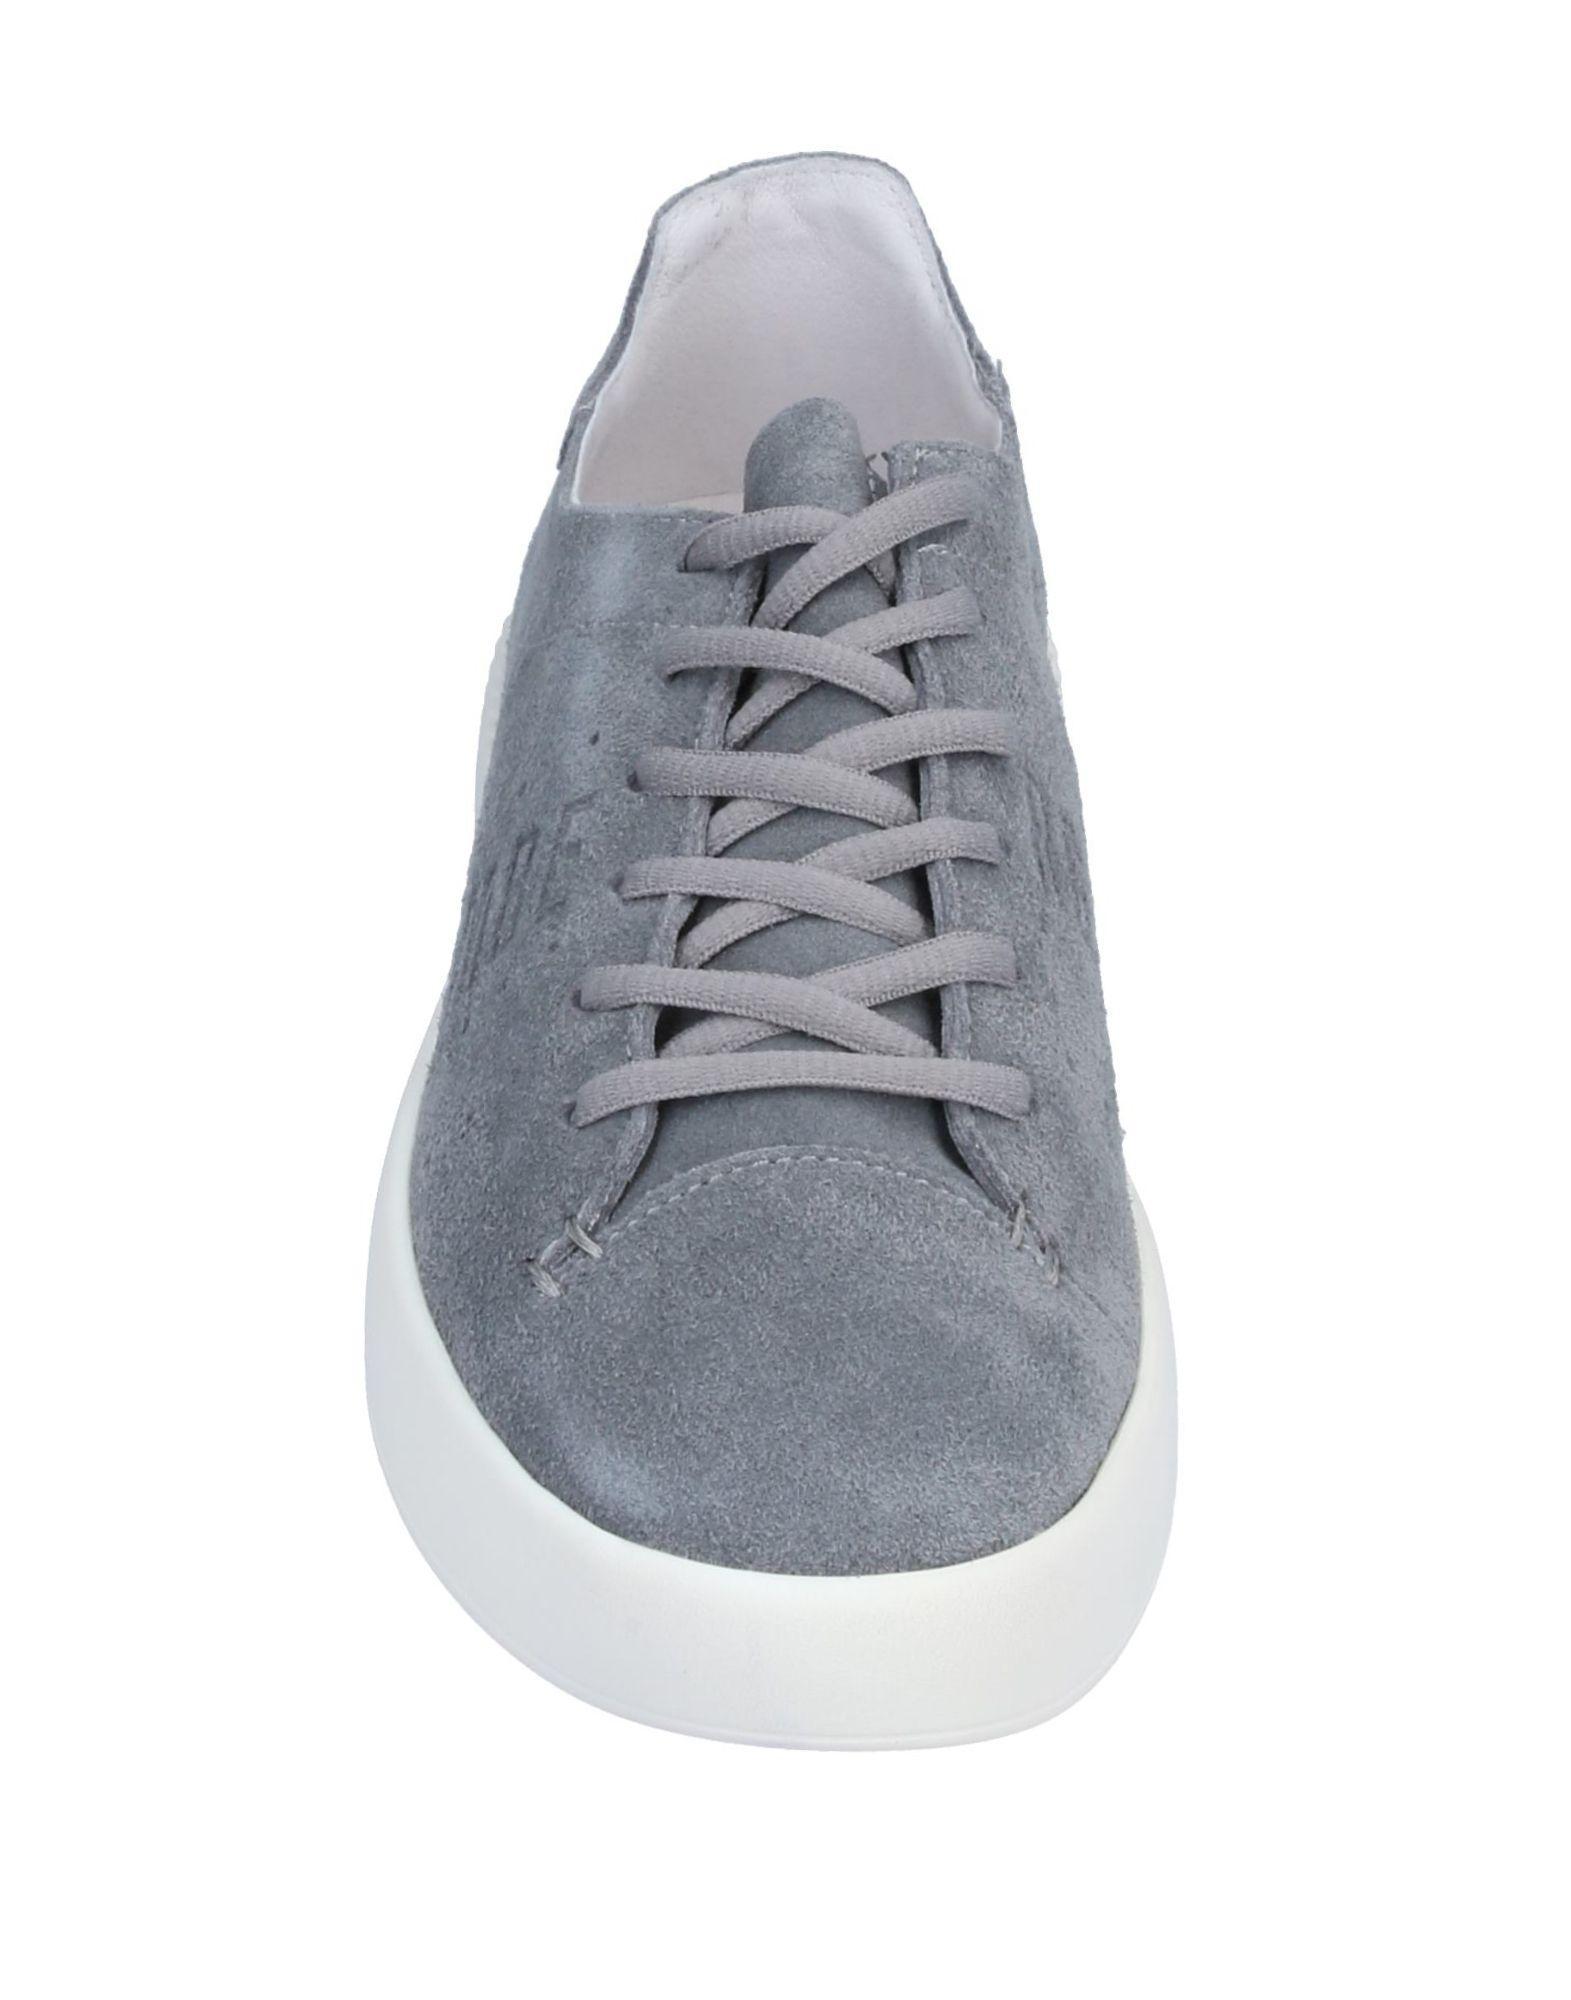 Sneakers & Deportivas Bikkembergs de Cuero de color Gris para hombre